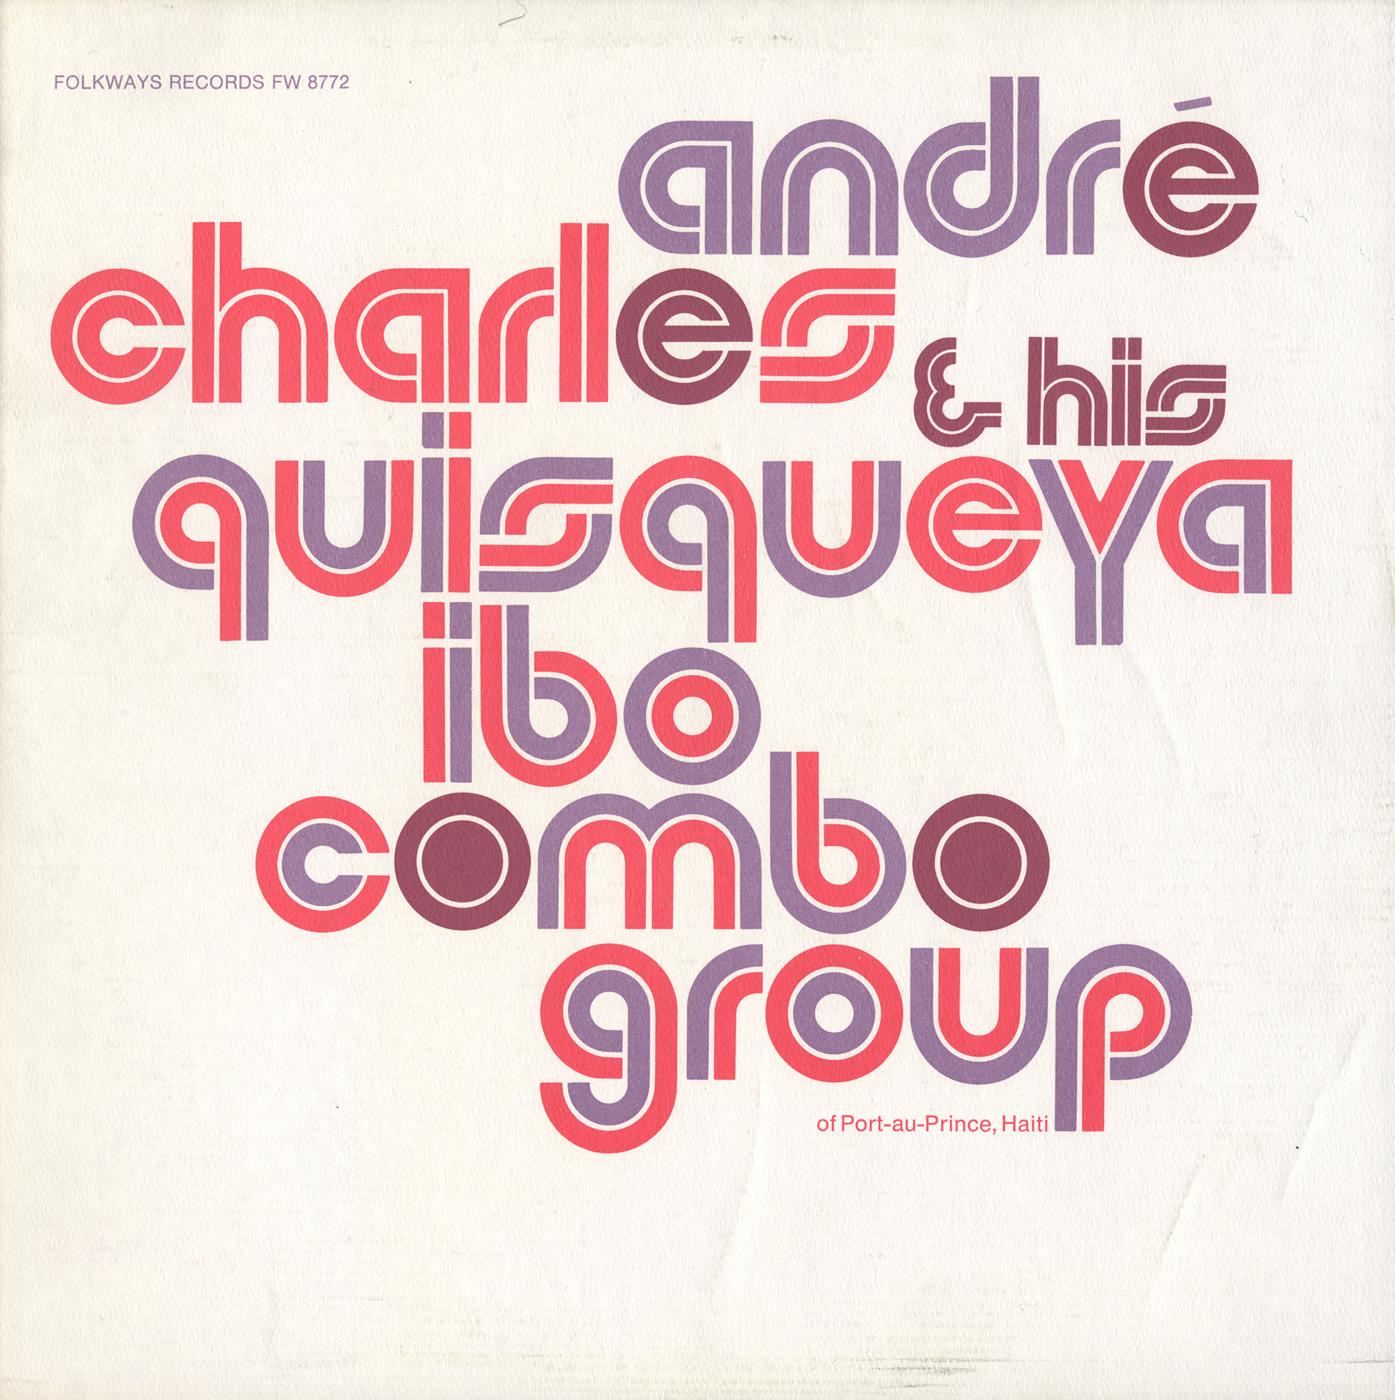 André Charles And His Quisqueya Ibo Combo Group (Haiti